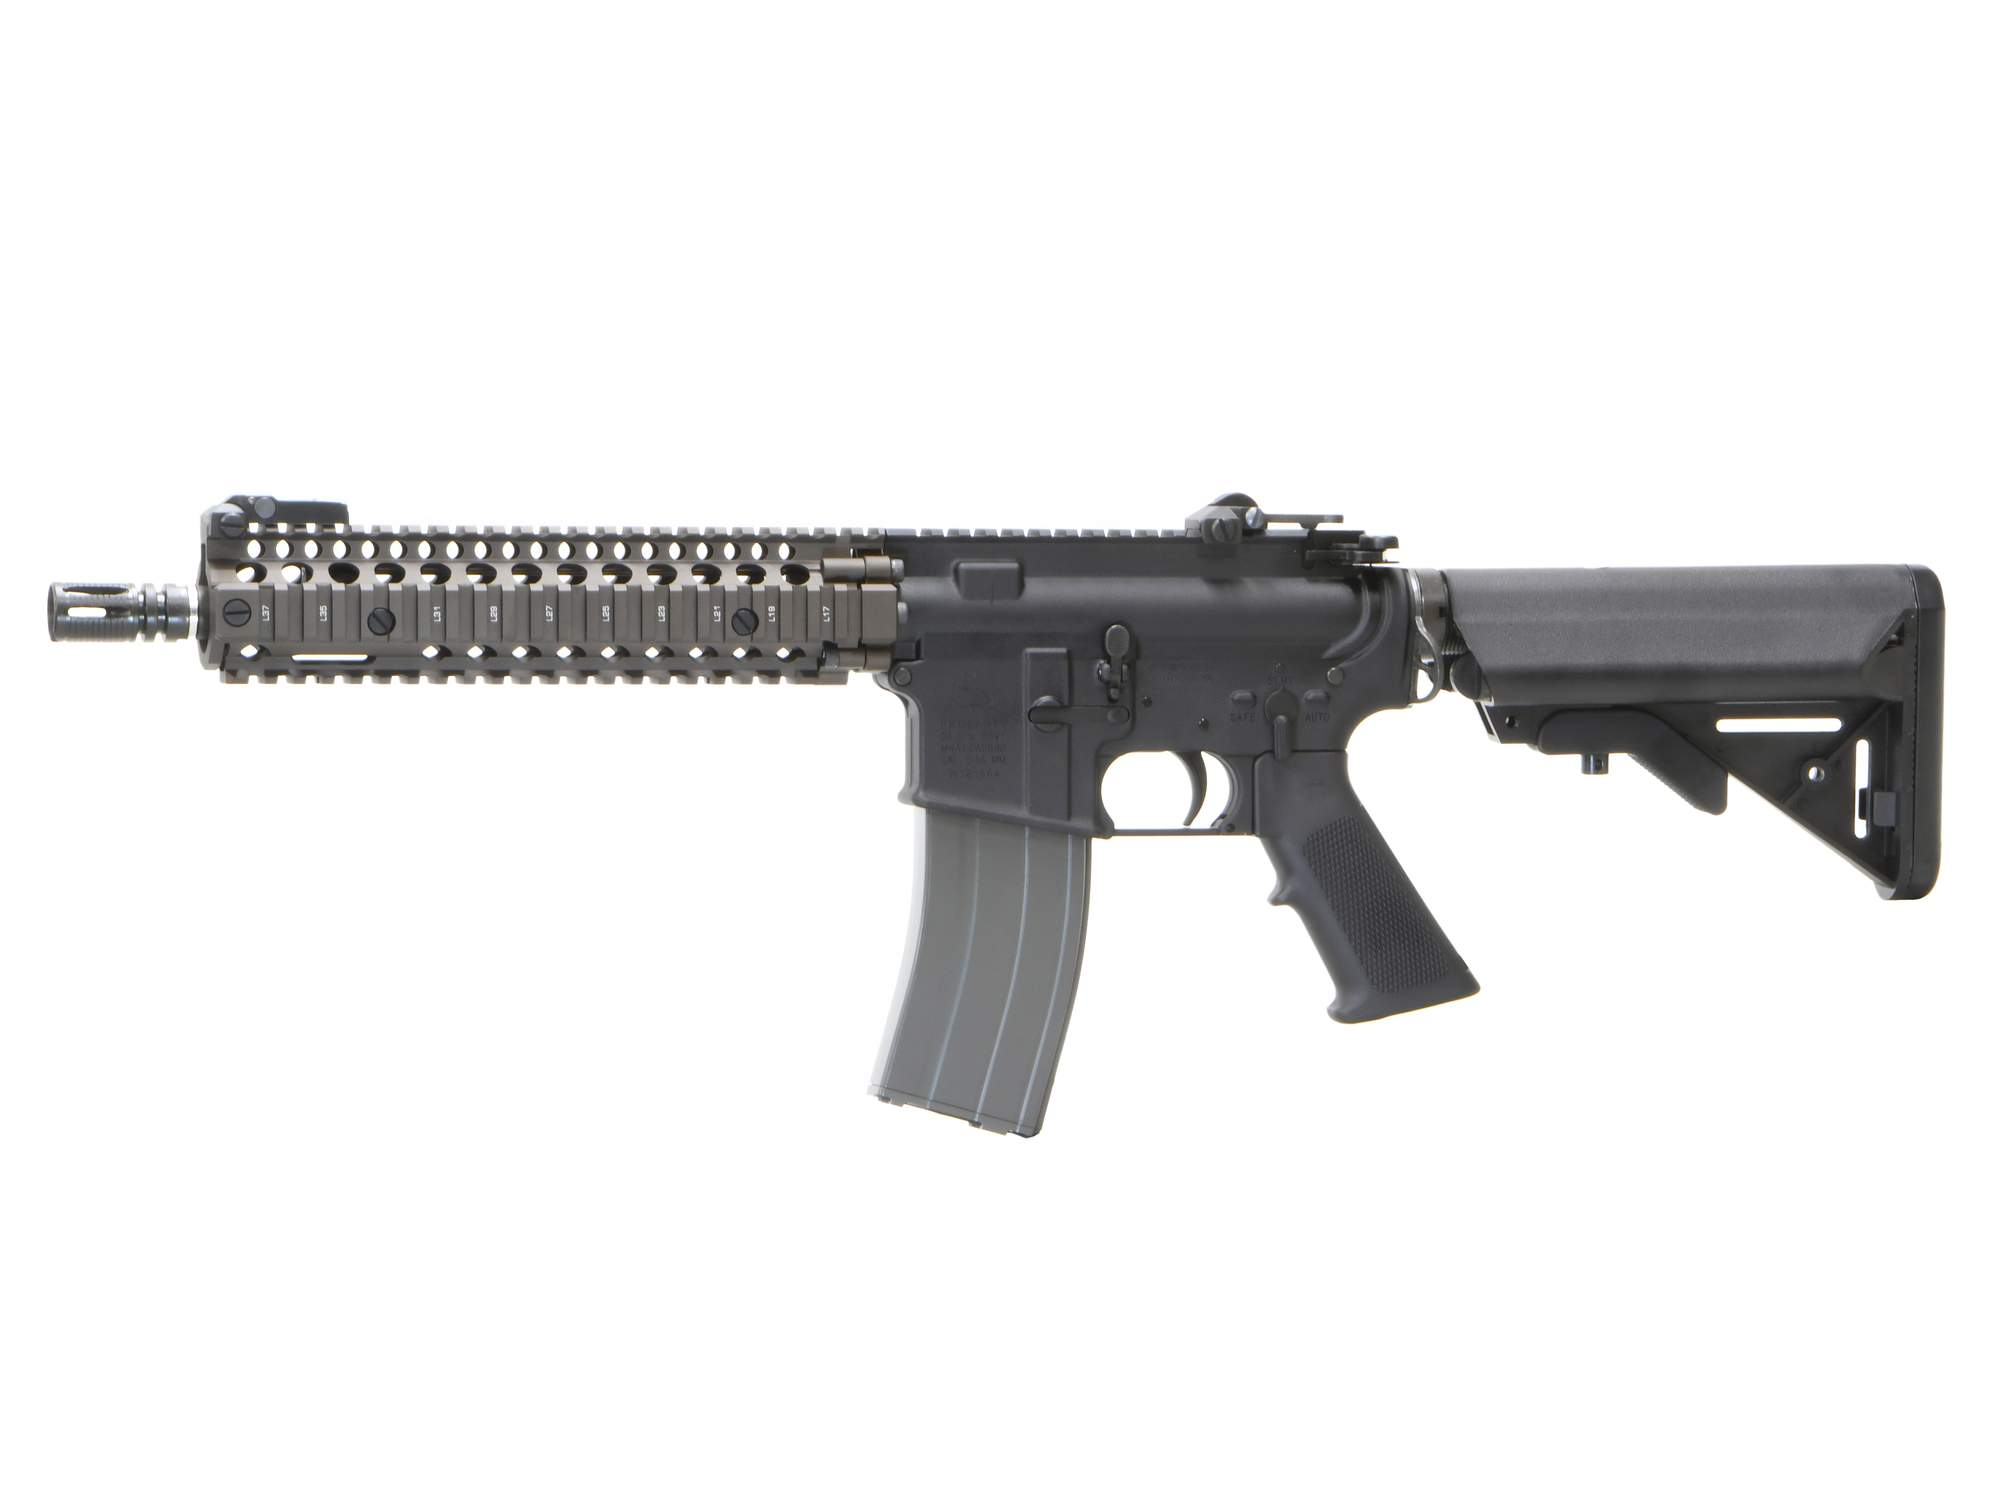 CyberGun(VFC) Colt MK18 MOD1 GBBR V2 (JPver.)